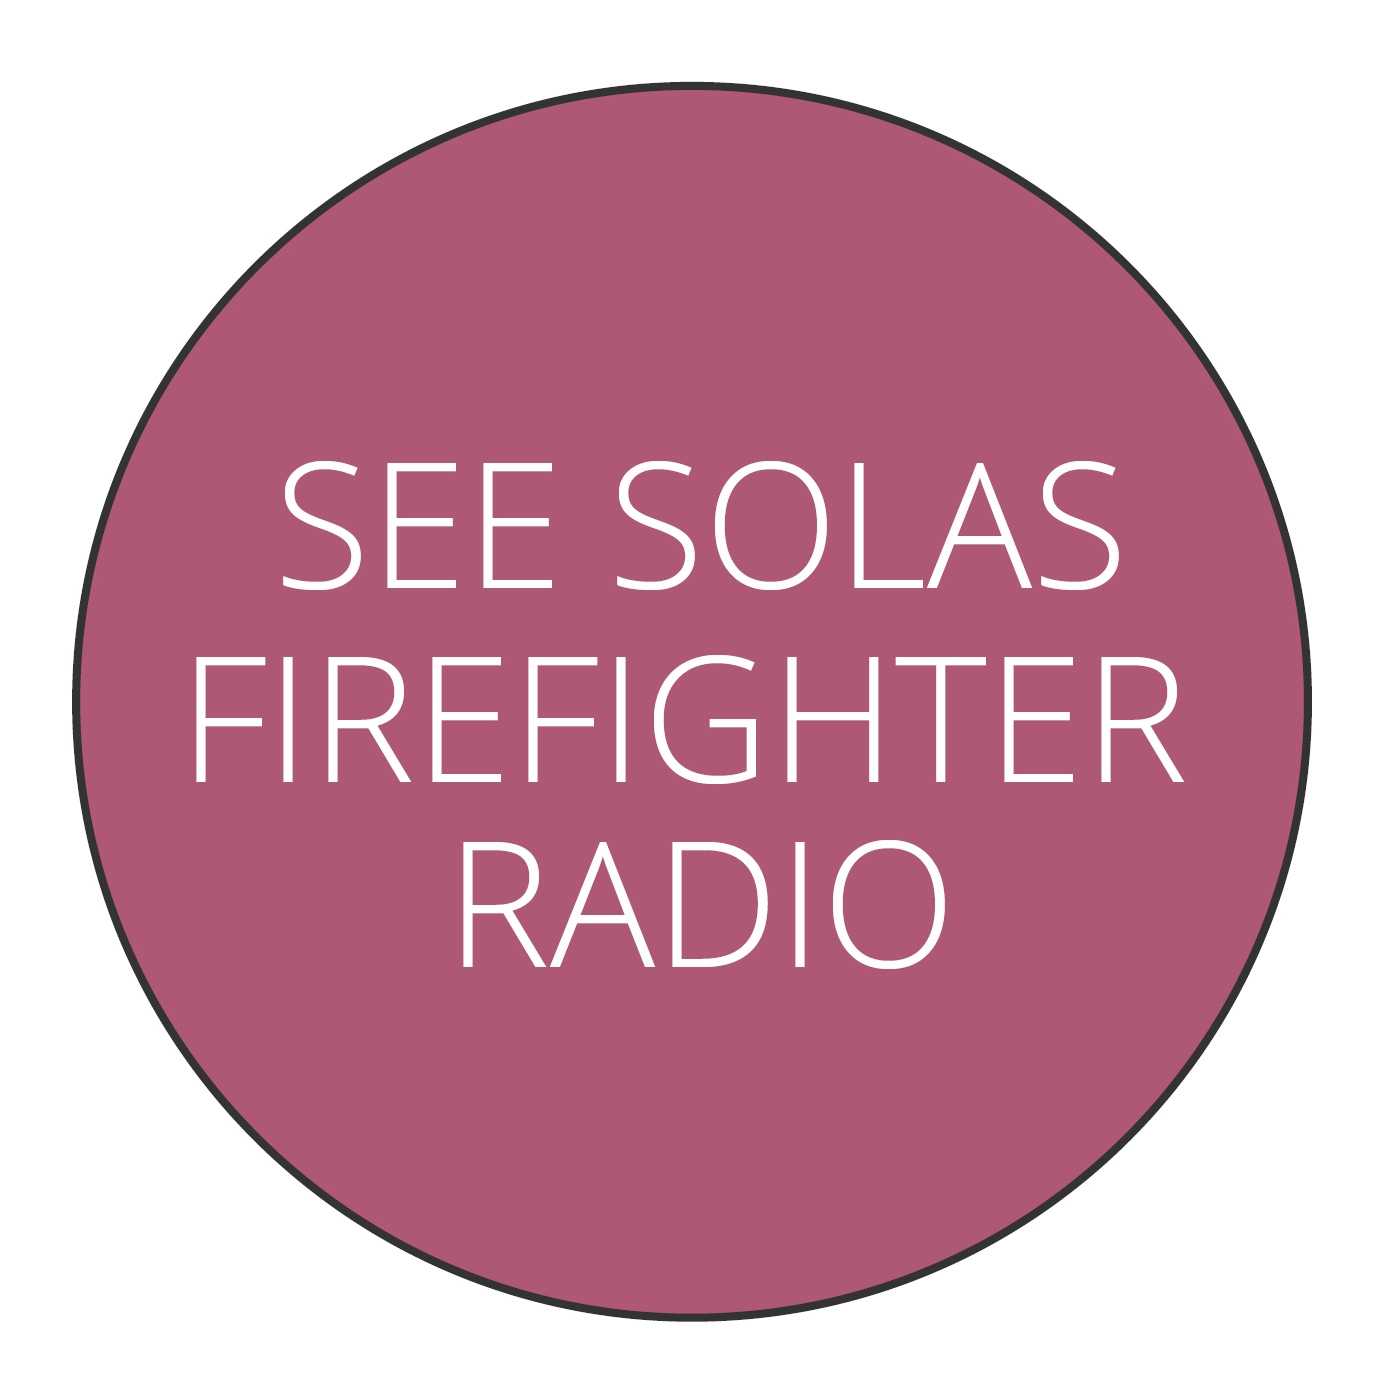 See solas firefighter radio